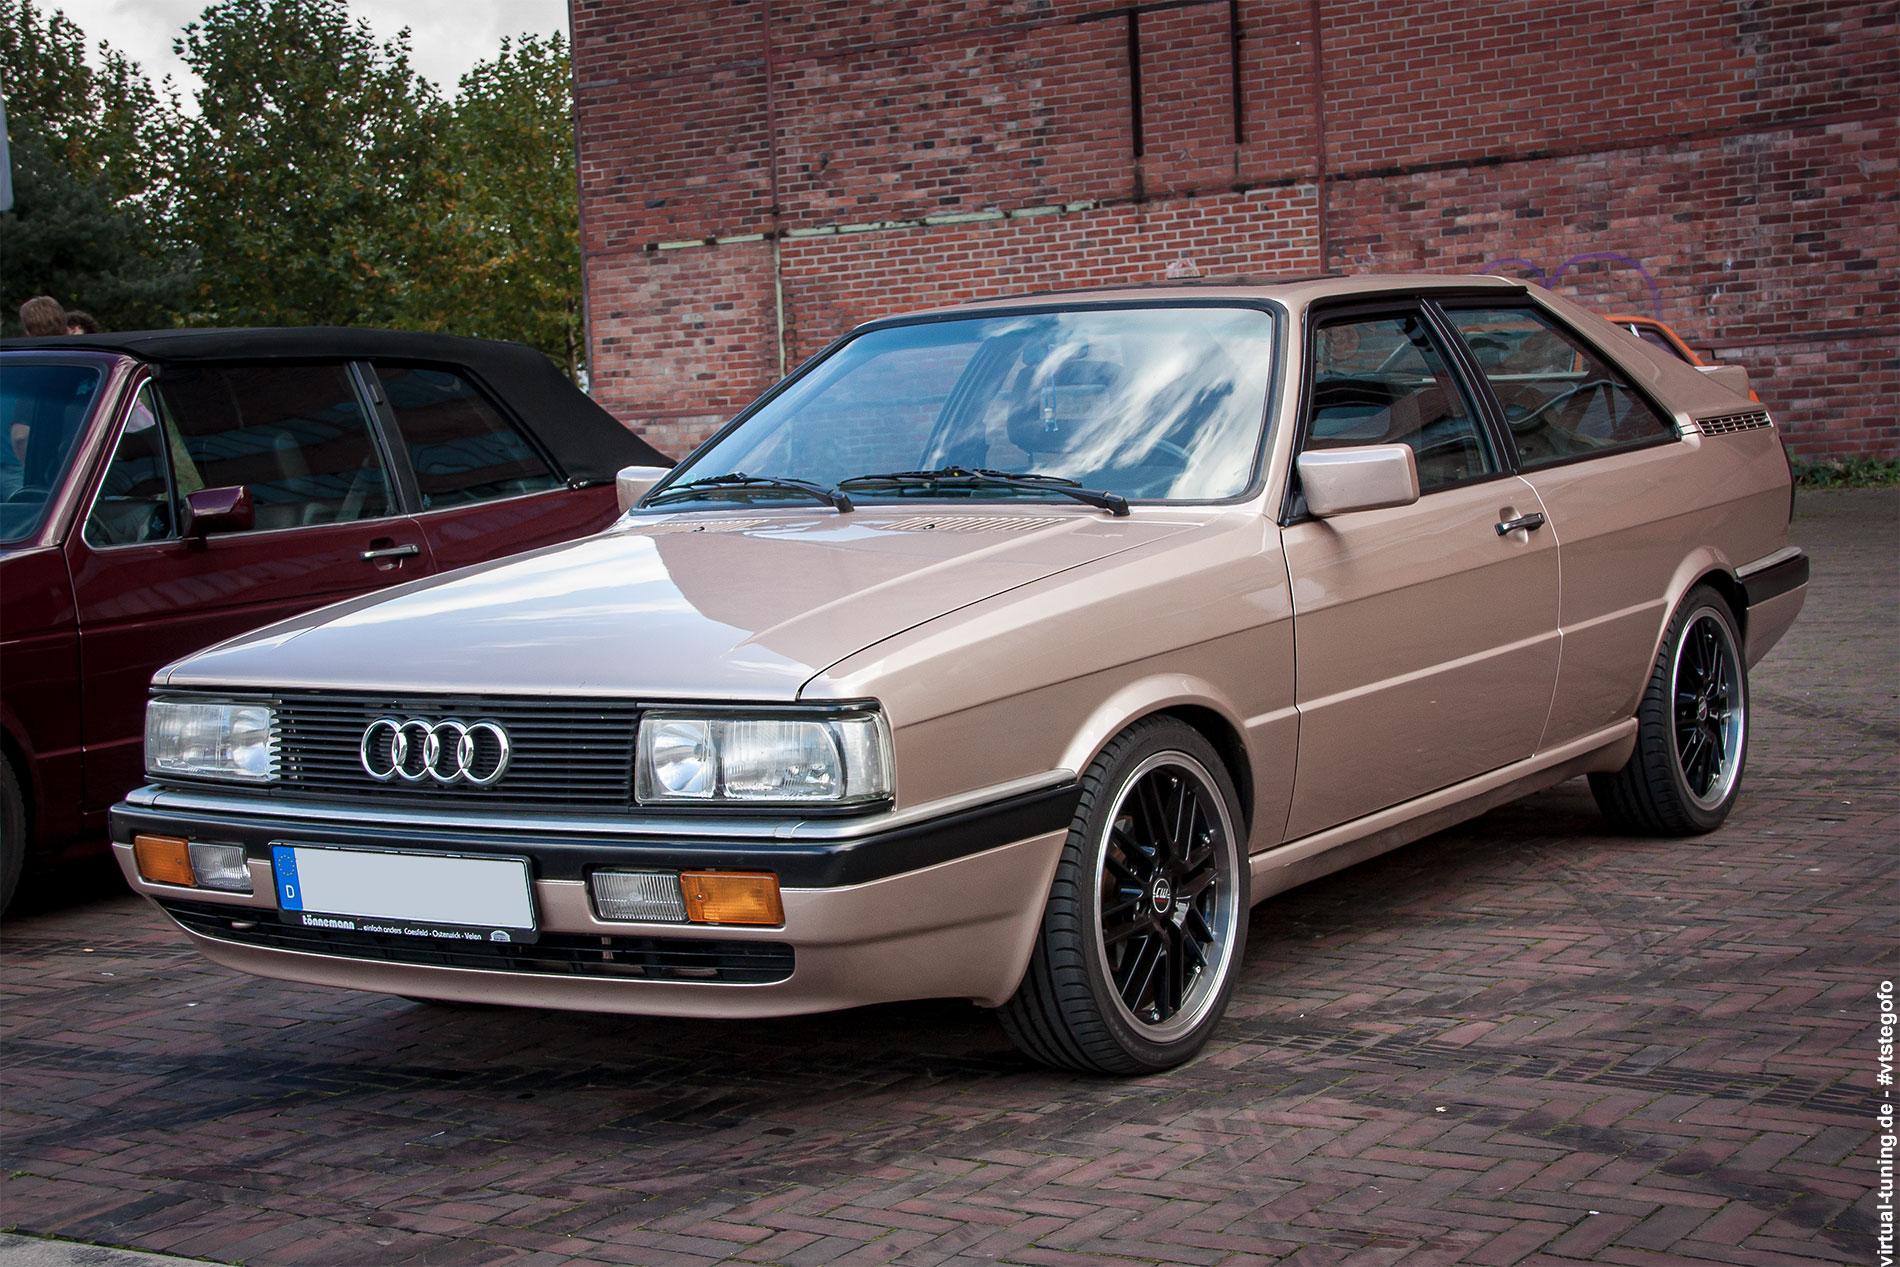 Audi Coupé - Oldtimertreff Ruhr (09.2016)